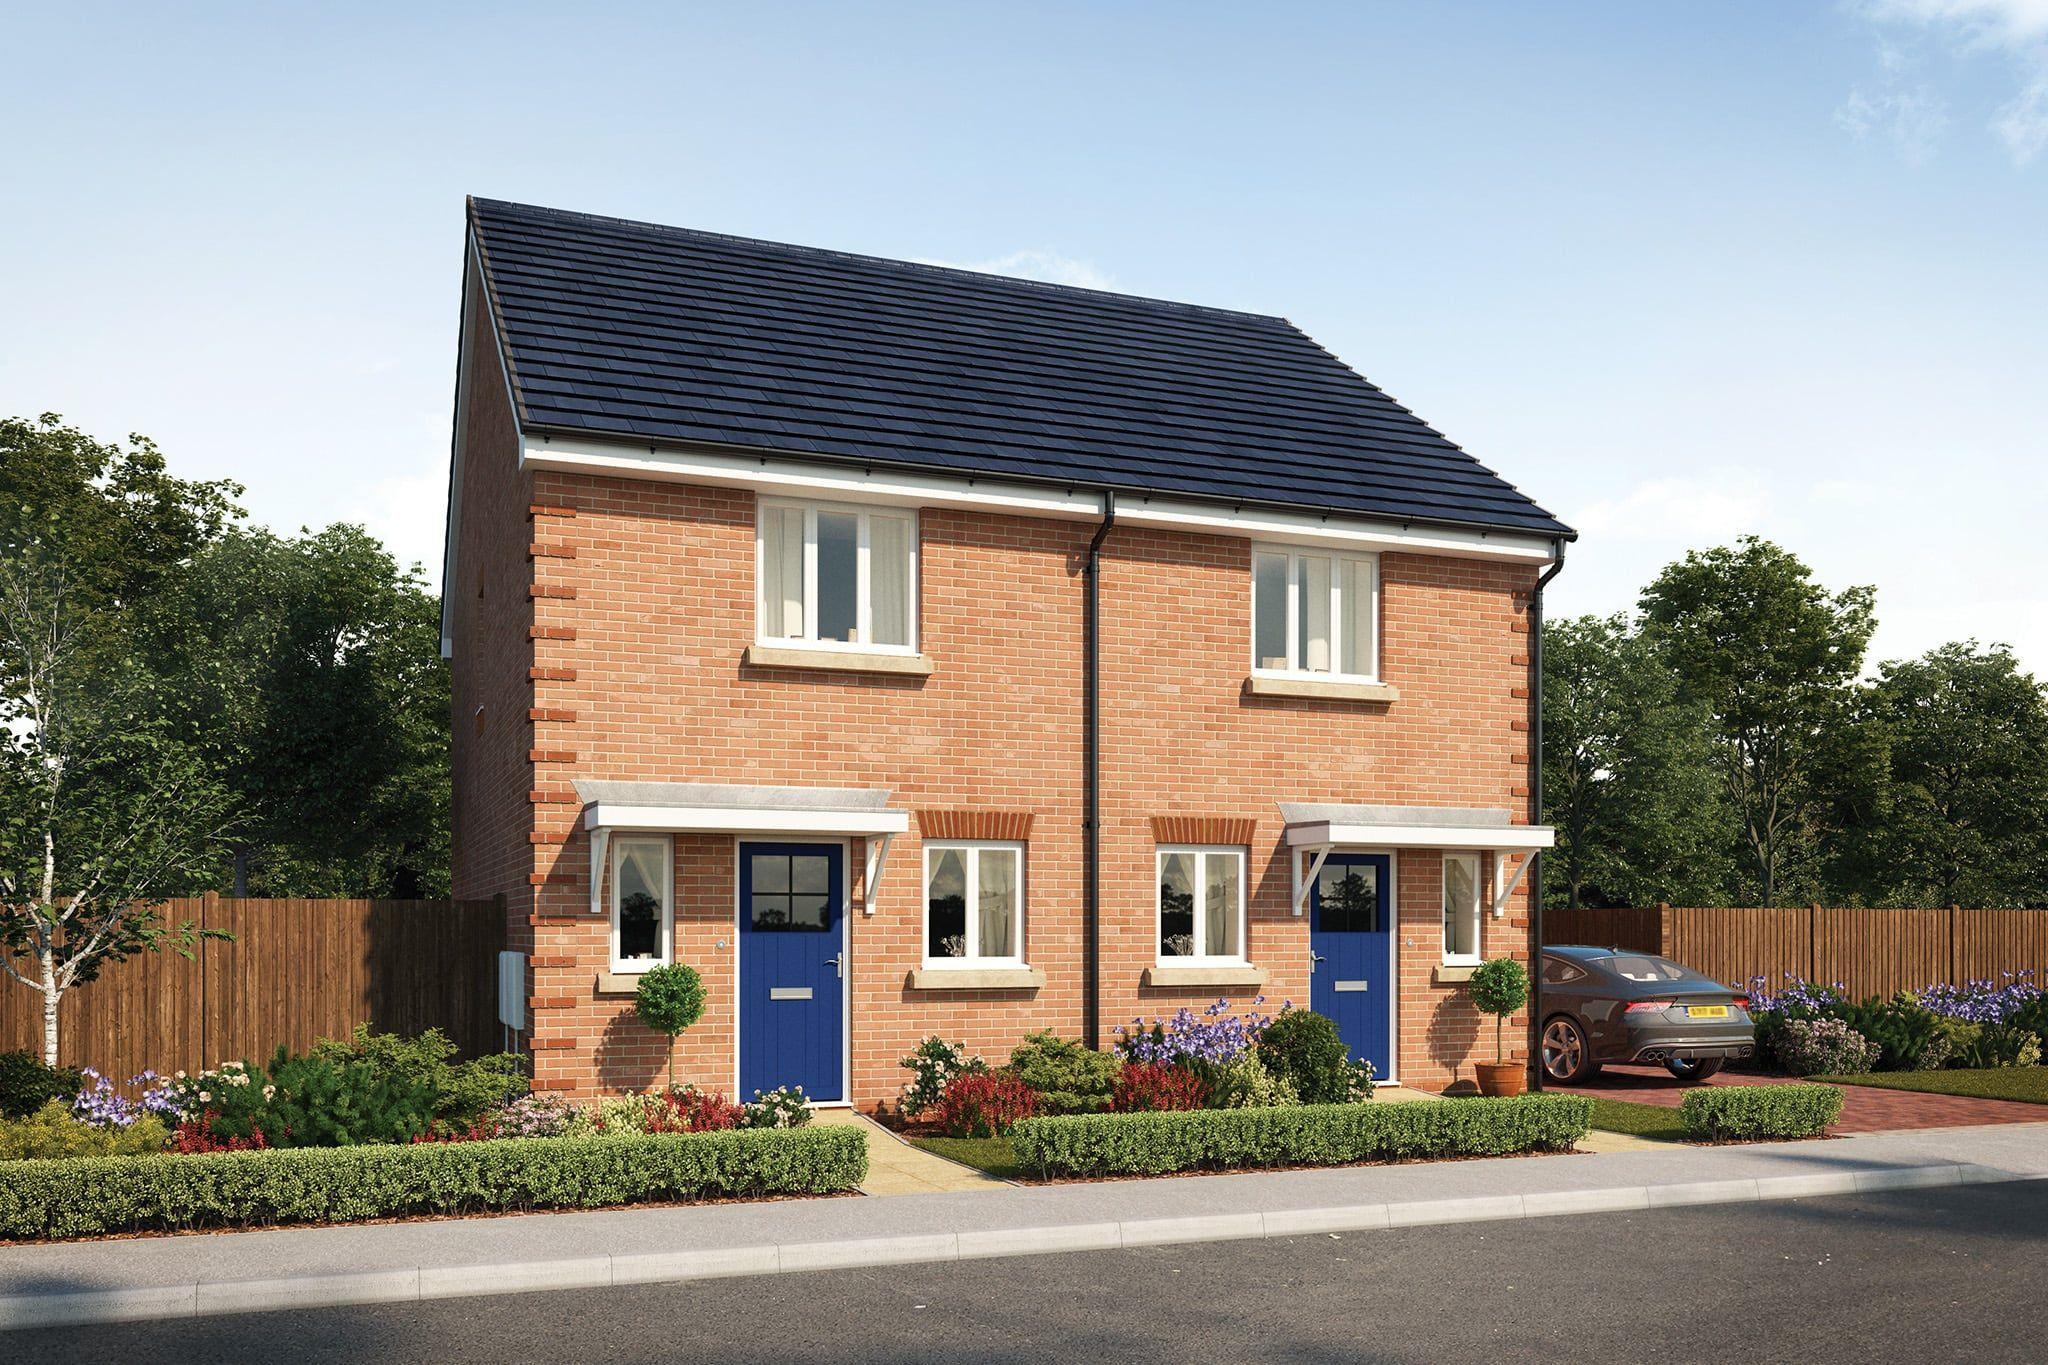 Buckthorn Grange development image 1 of 1